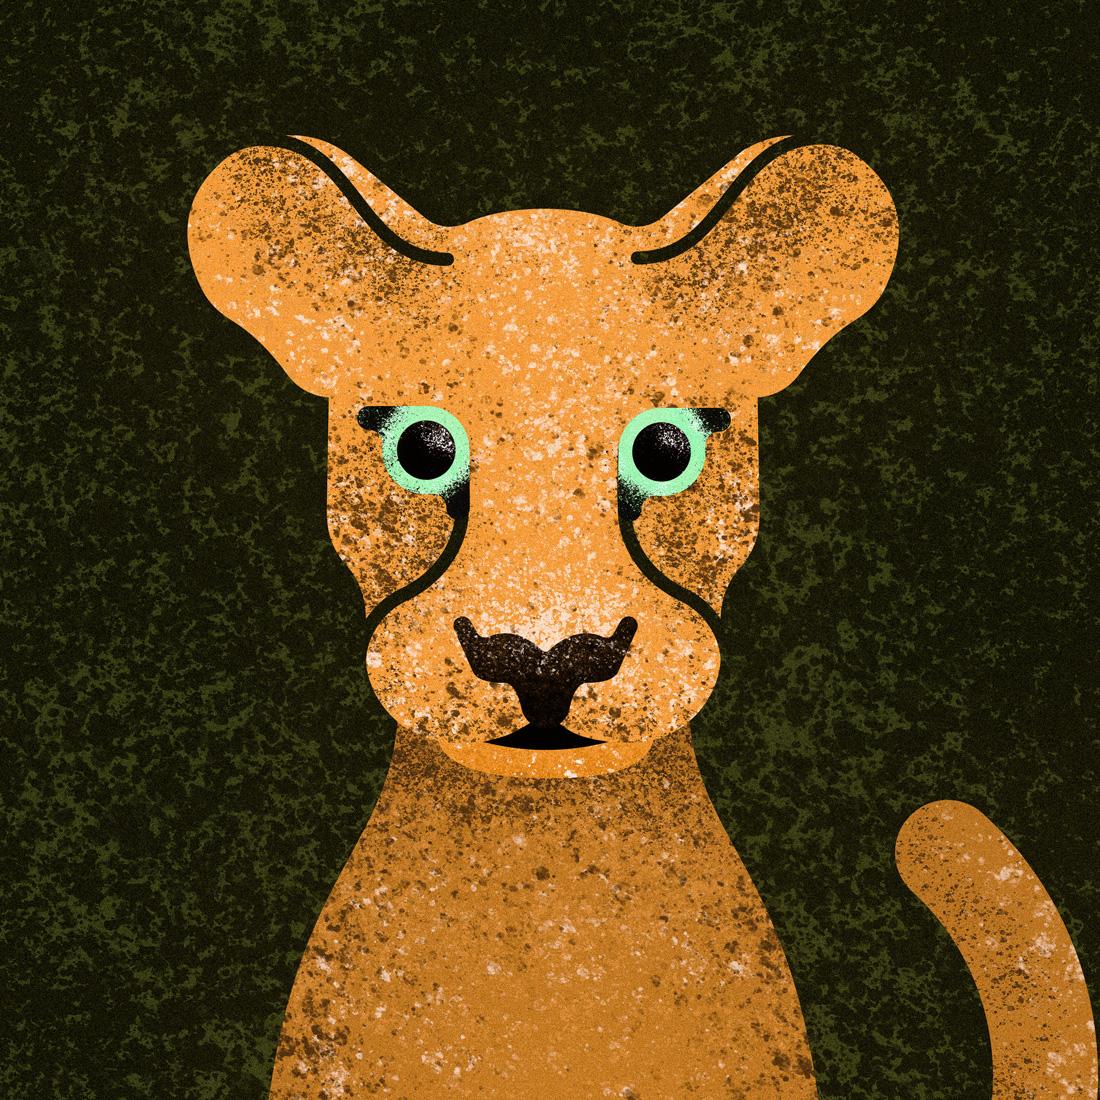 cougar_small.jpg